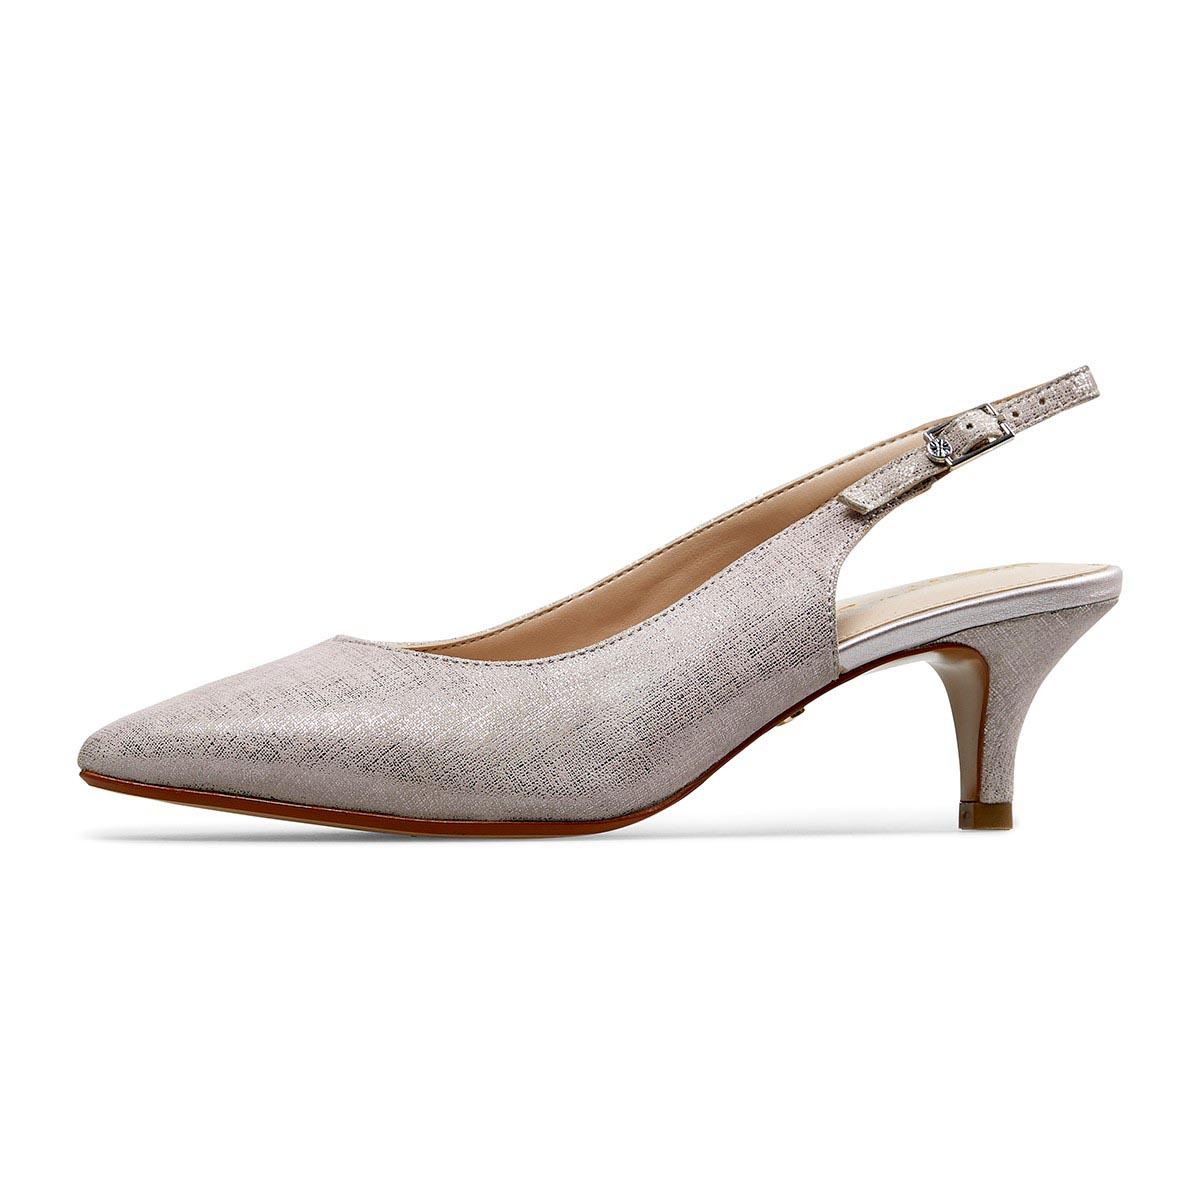 Van Dal - Dene Orchid Print Occasion Shoe